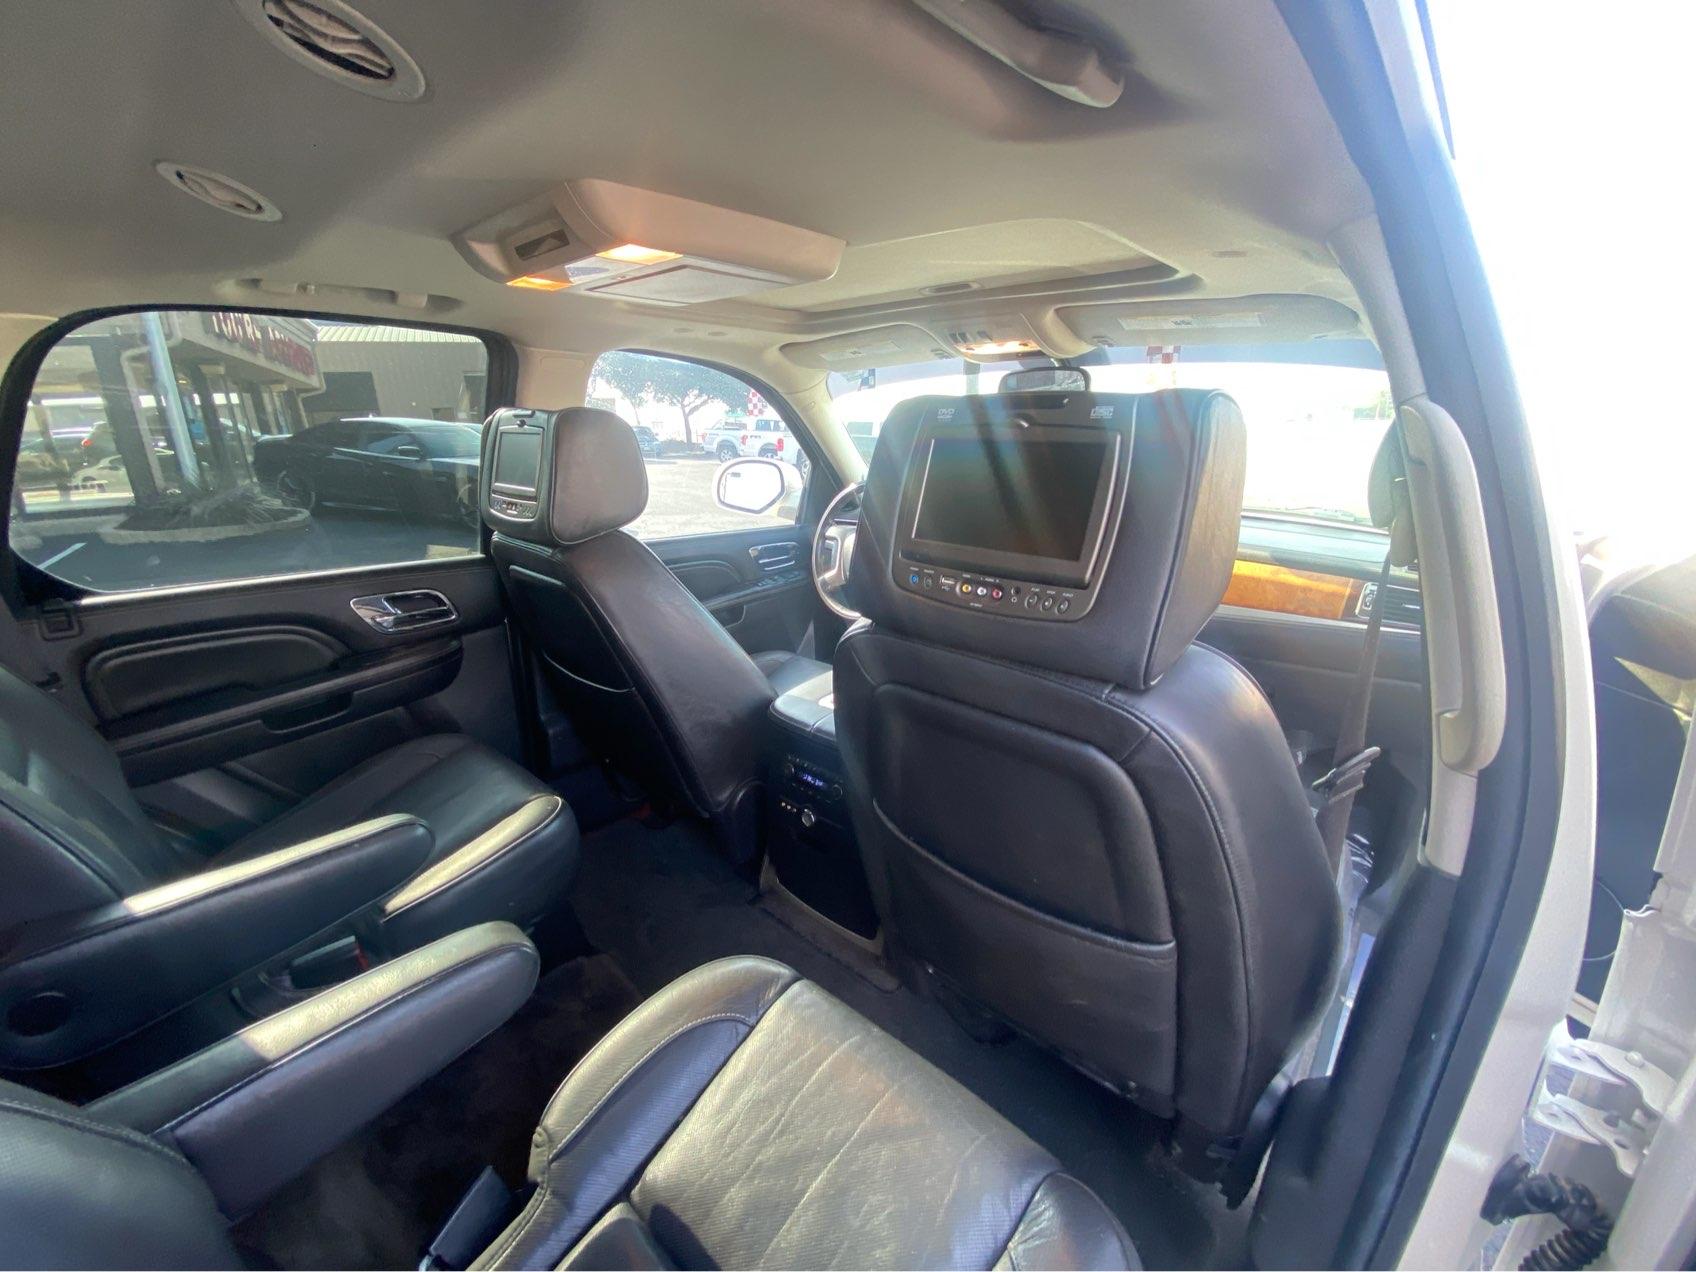 used vehicle - SUV CADILLAC ESCALADE 2013